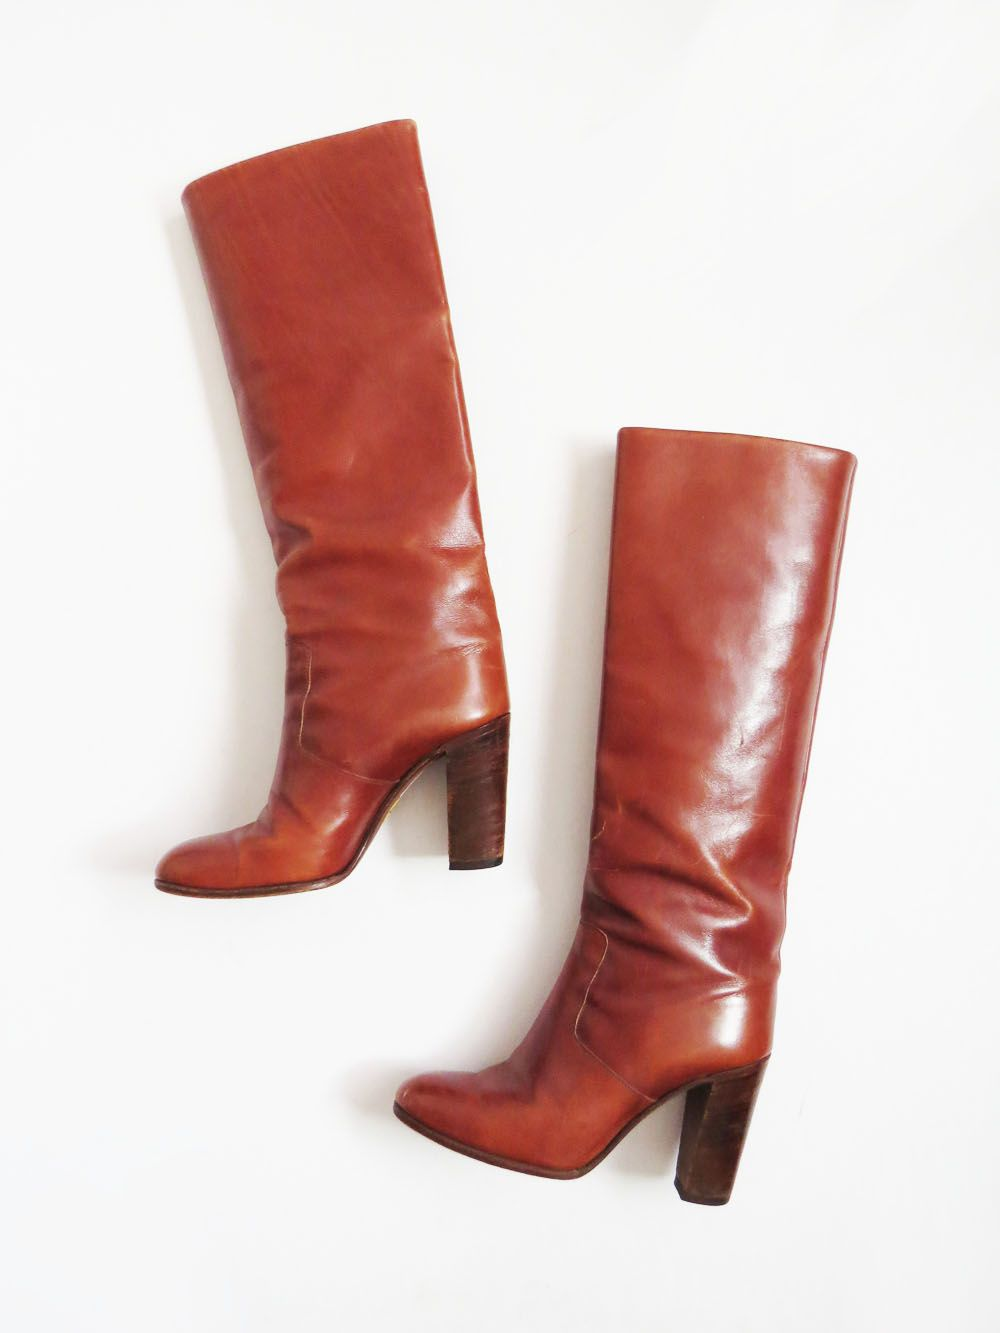 8a89db17113b 1970's Knee High Boots // SIZE 7 Vintage Italian Boots // #BarnabyJack Ugg